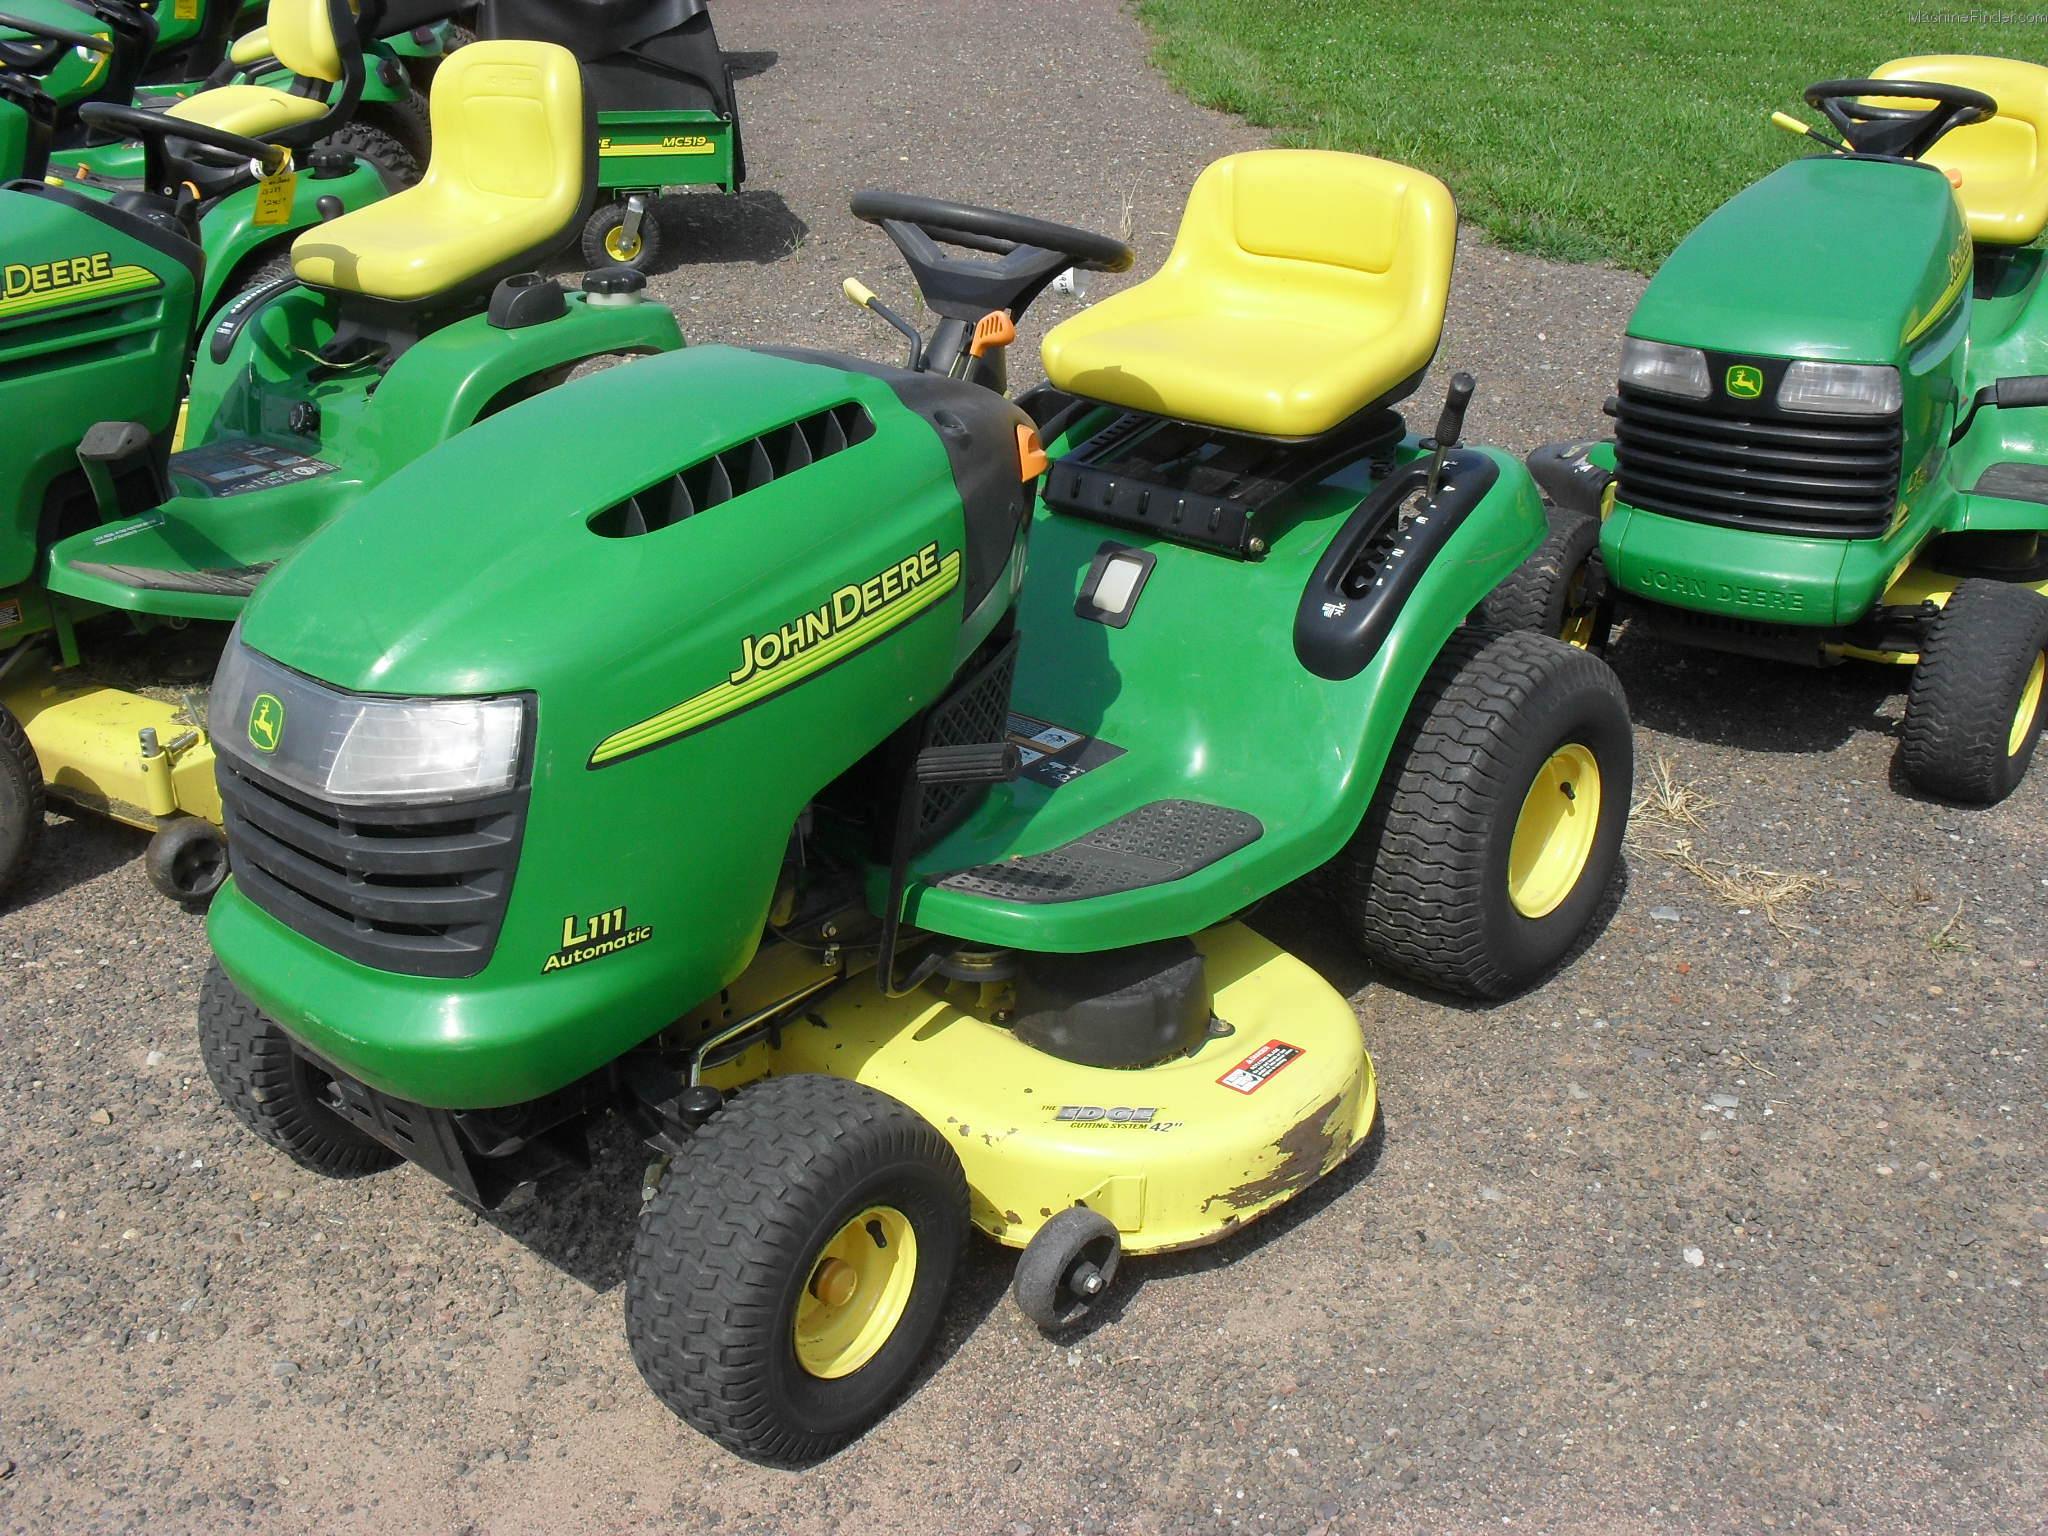 2005 John Deere L111 Lawn & Garden and Commercial Mowing - John Deere ...